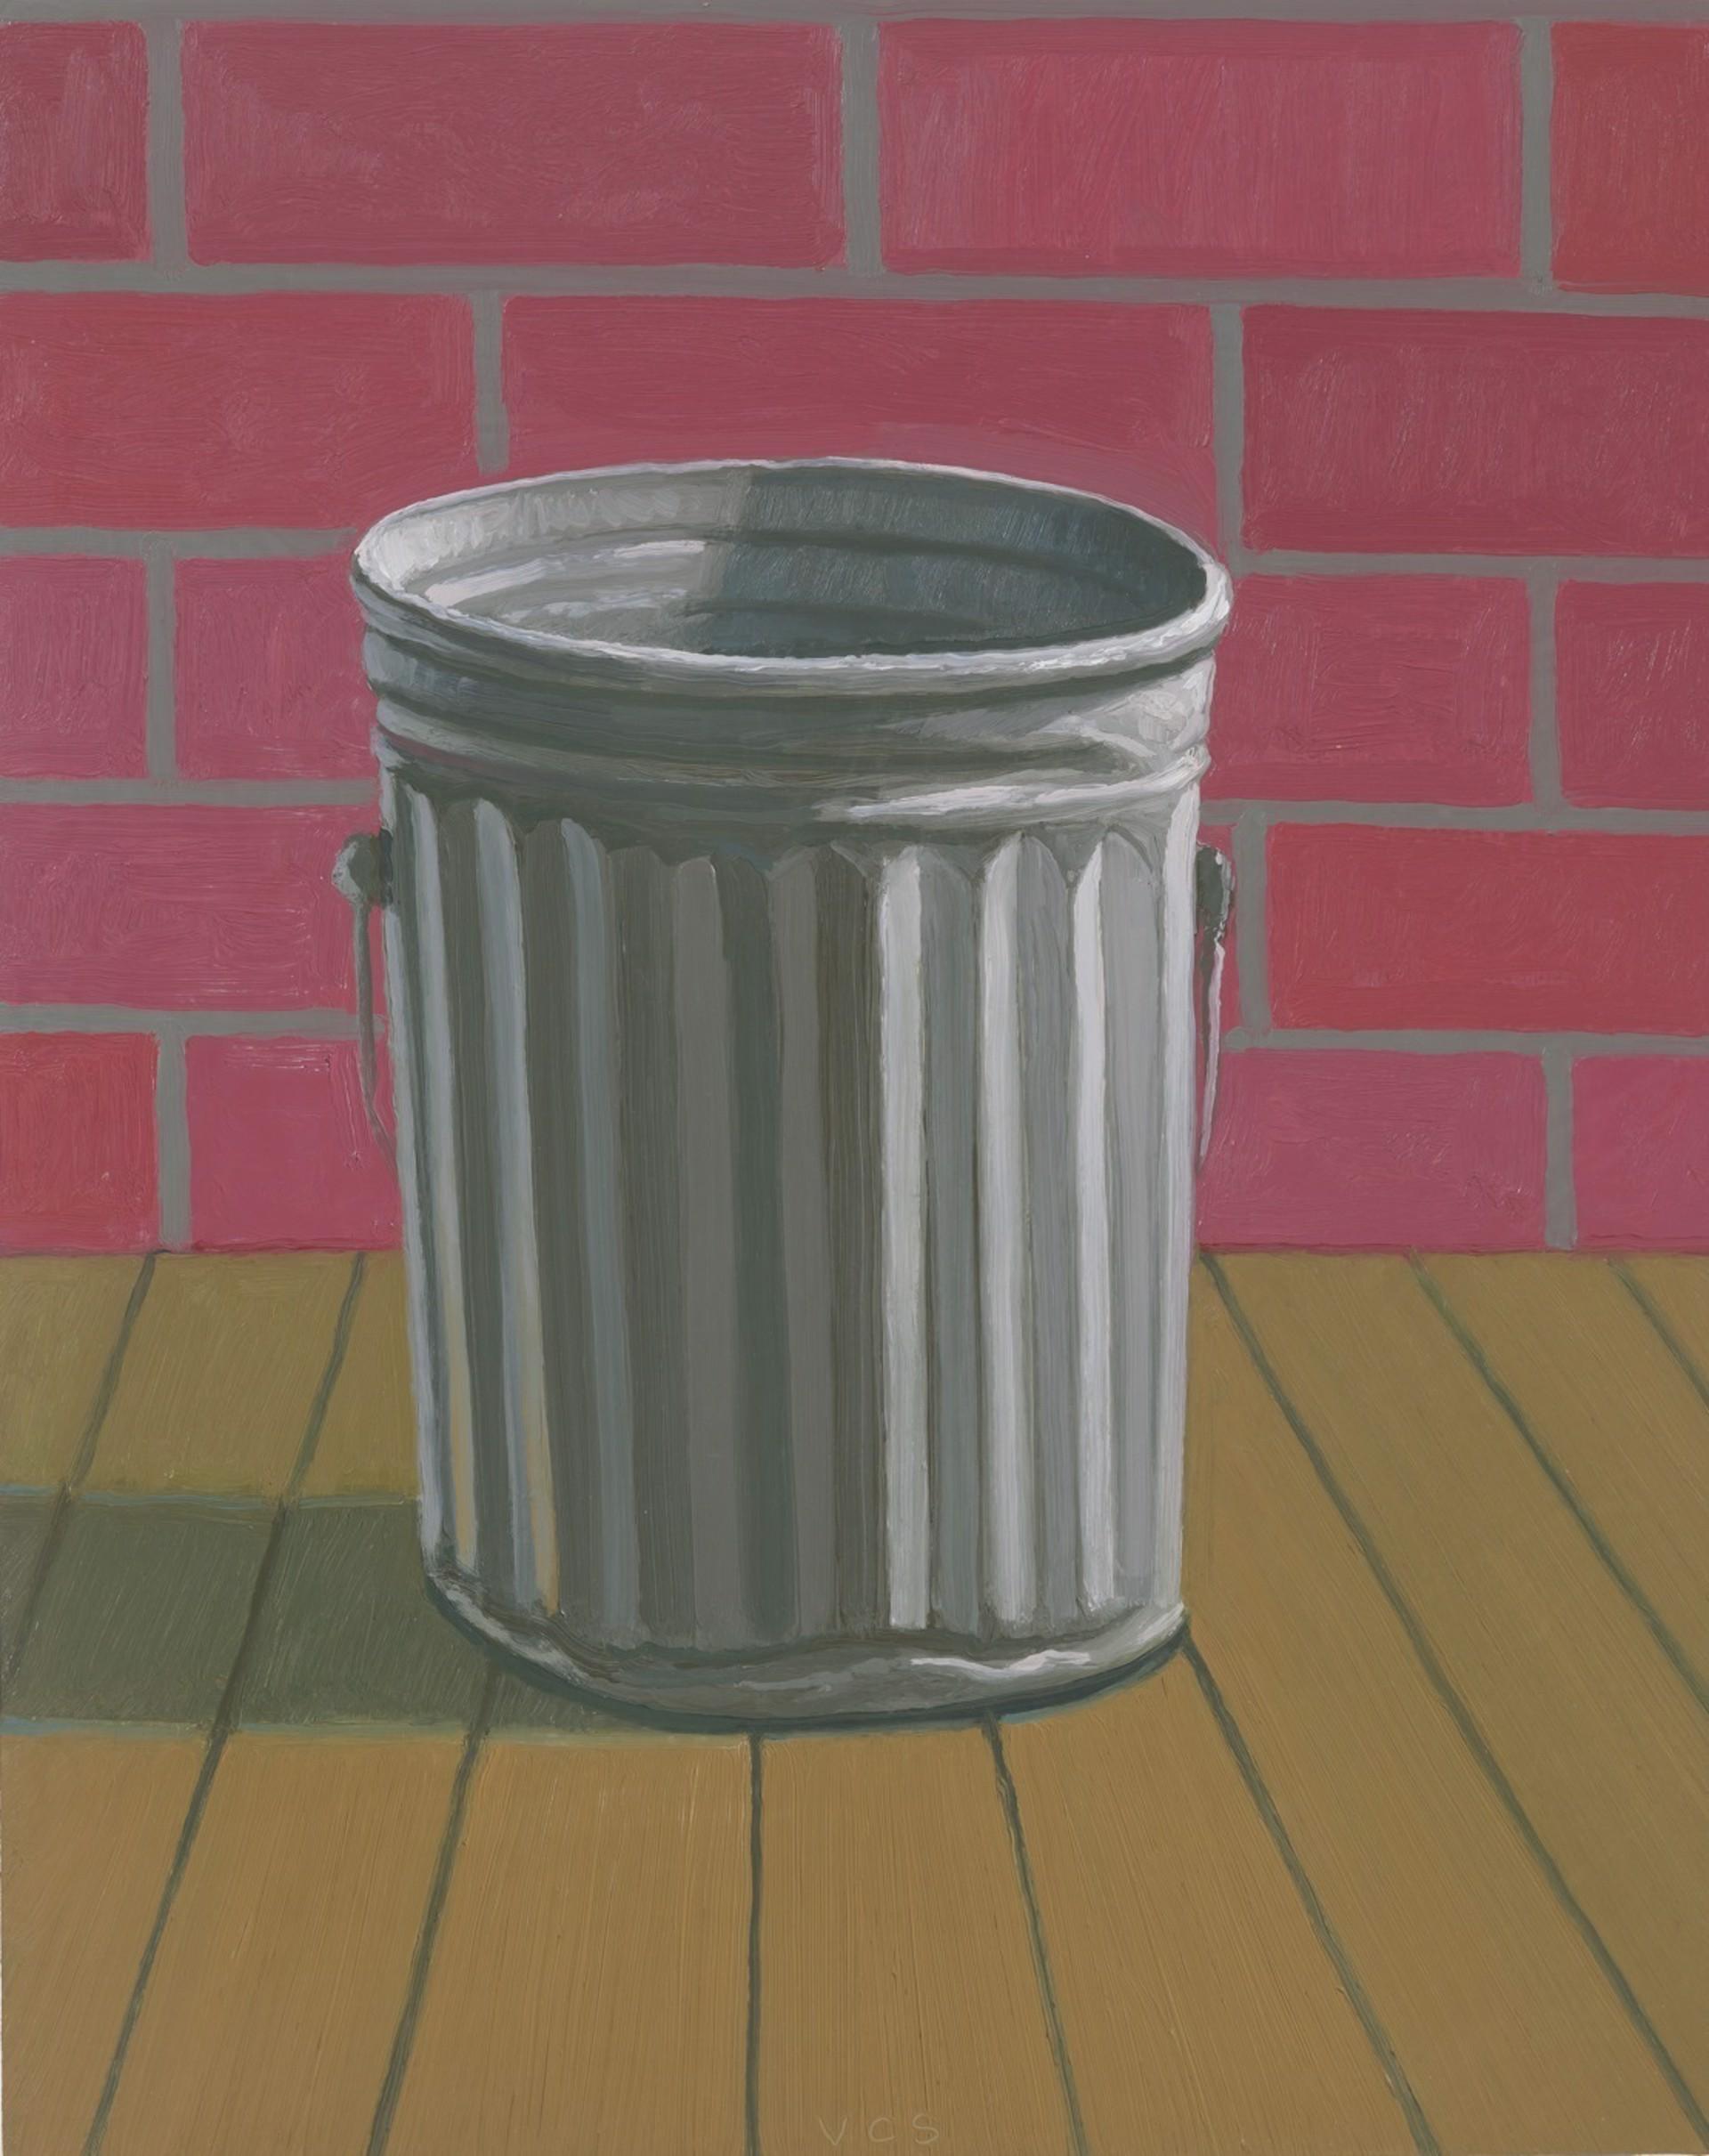 Trashcan (Brick Wall) by Vonn Cummings Sumner